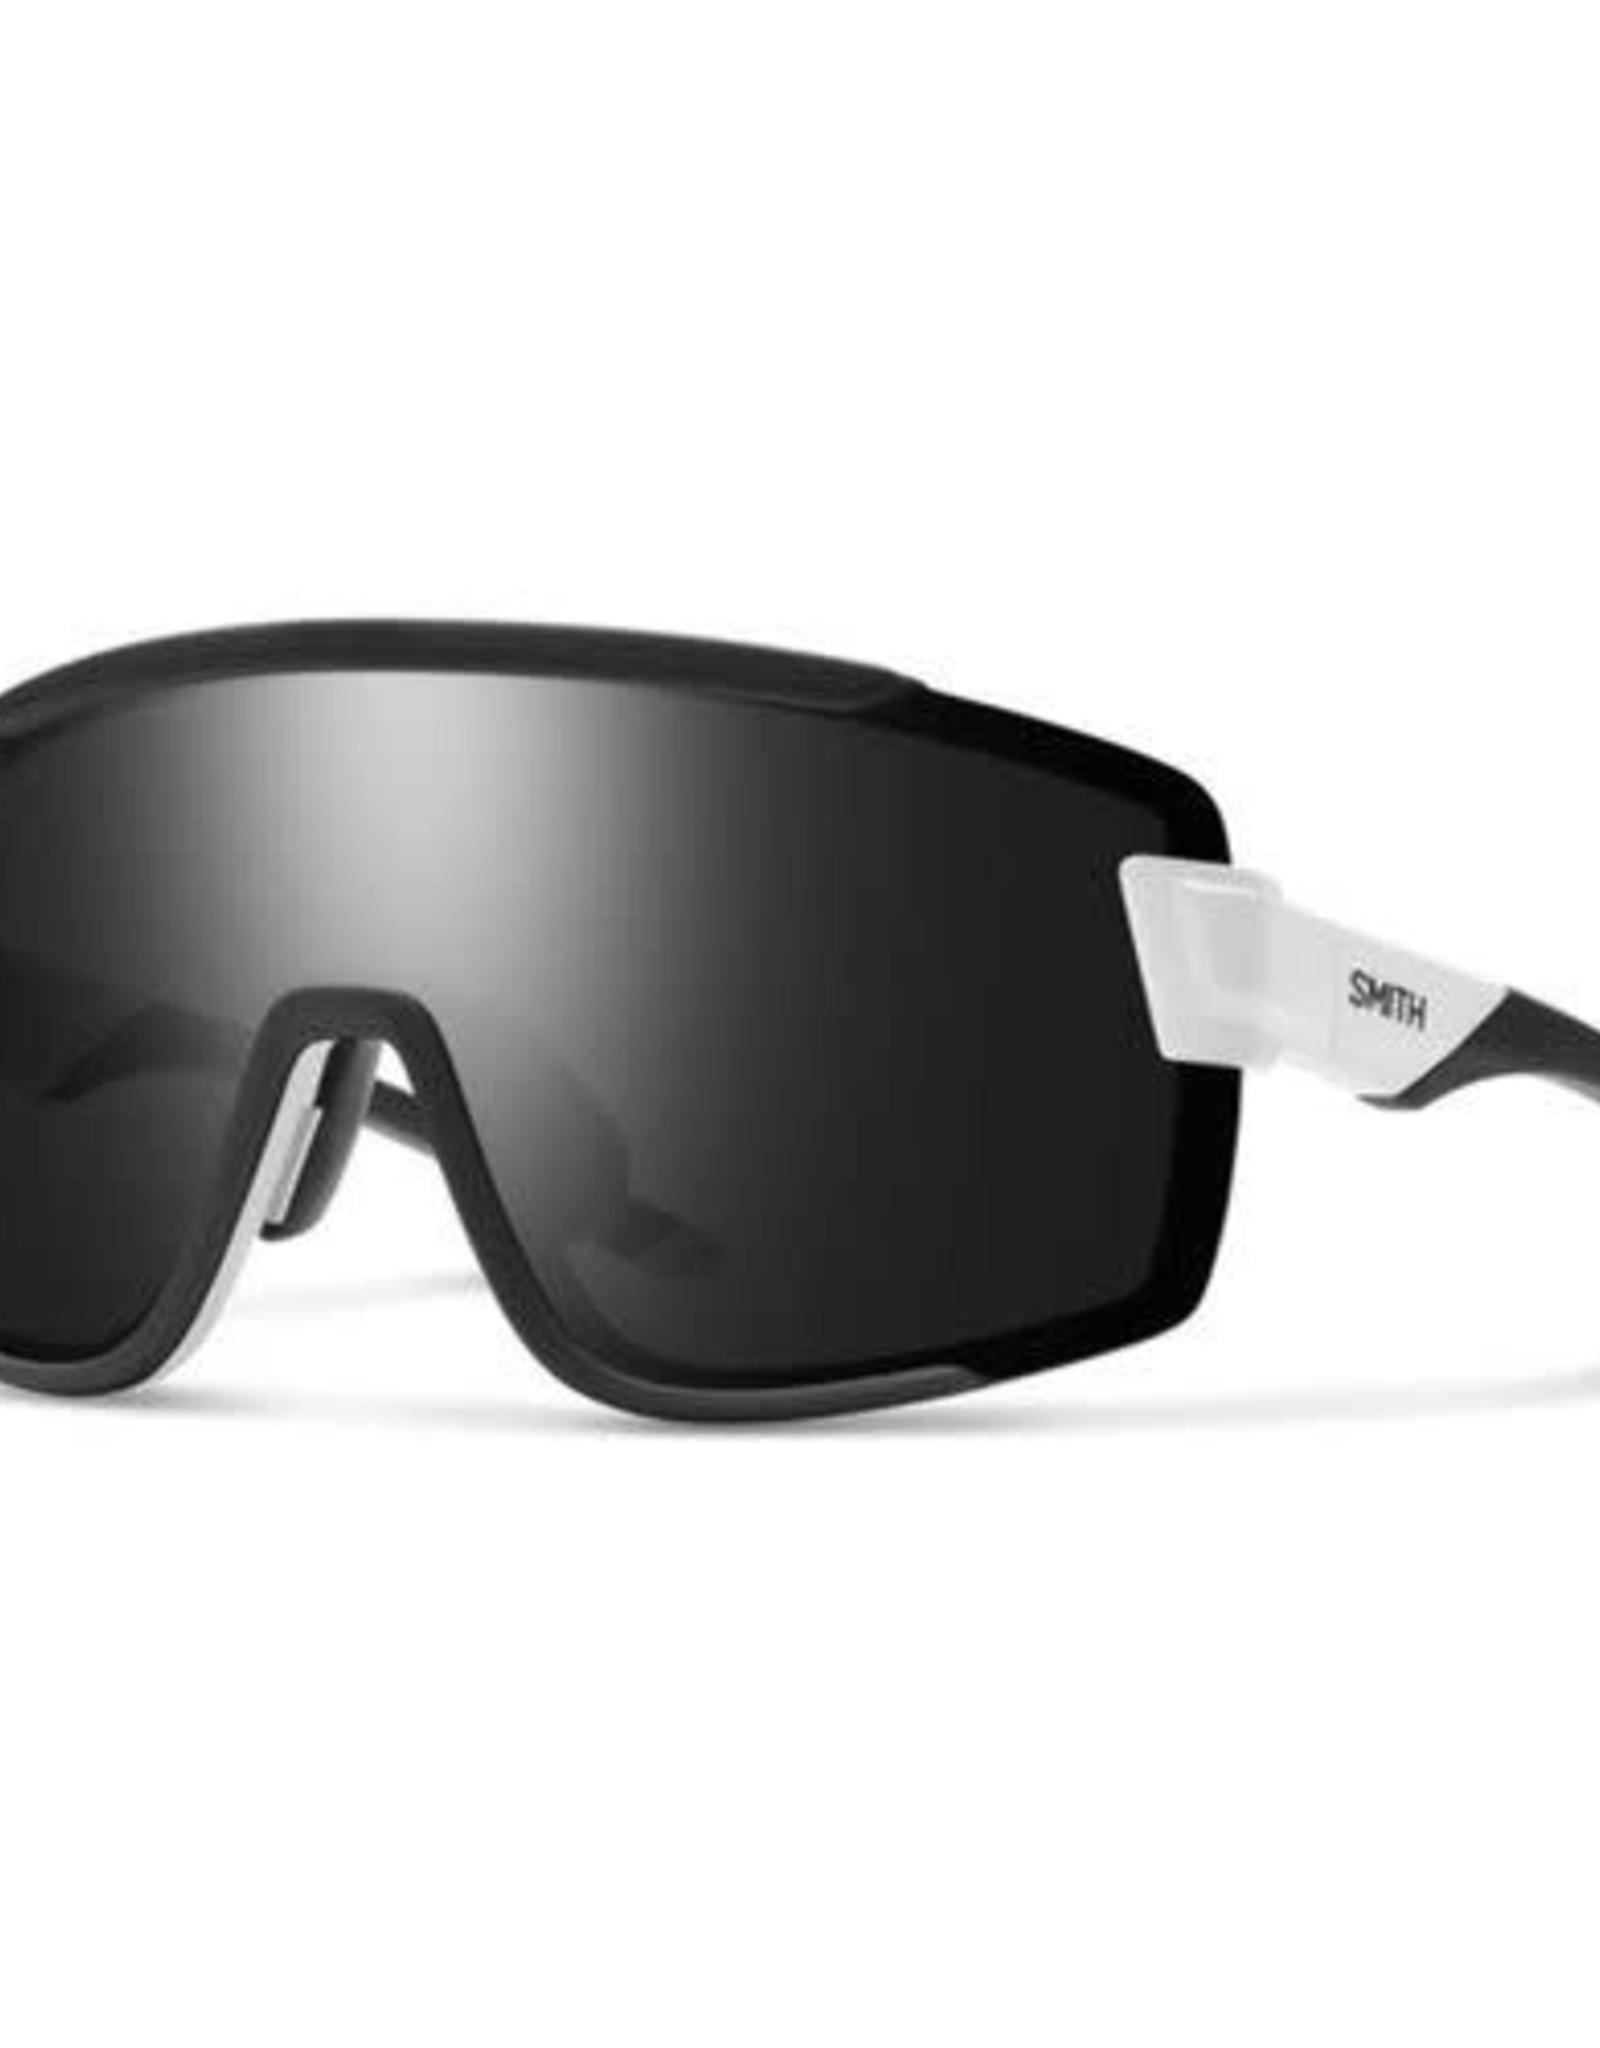 SMITH OPTICS SMITH Sunglasses WILDCAT Matte White ChromaPop Black/Clear